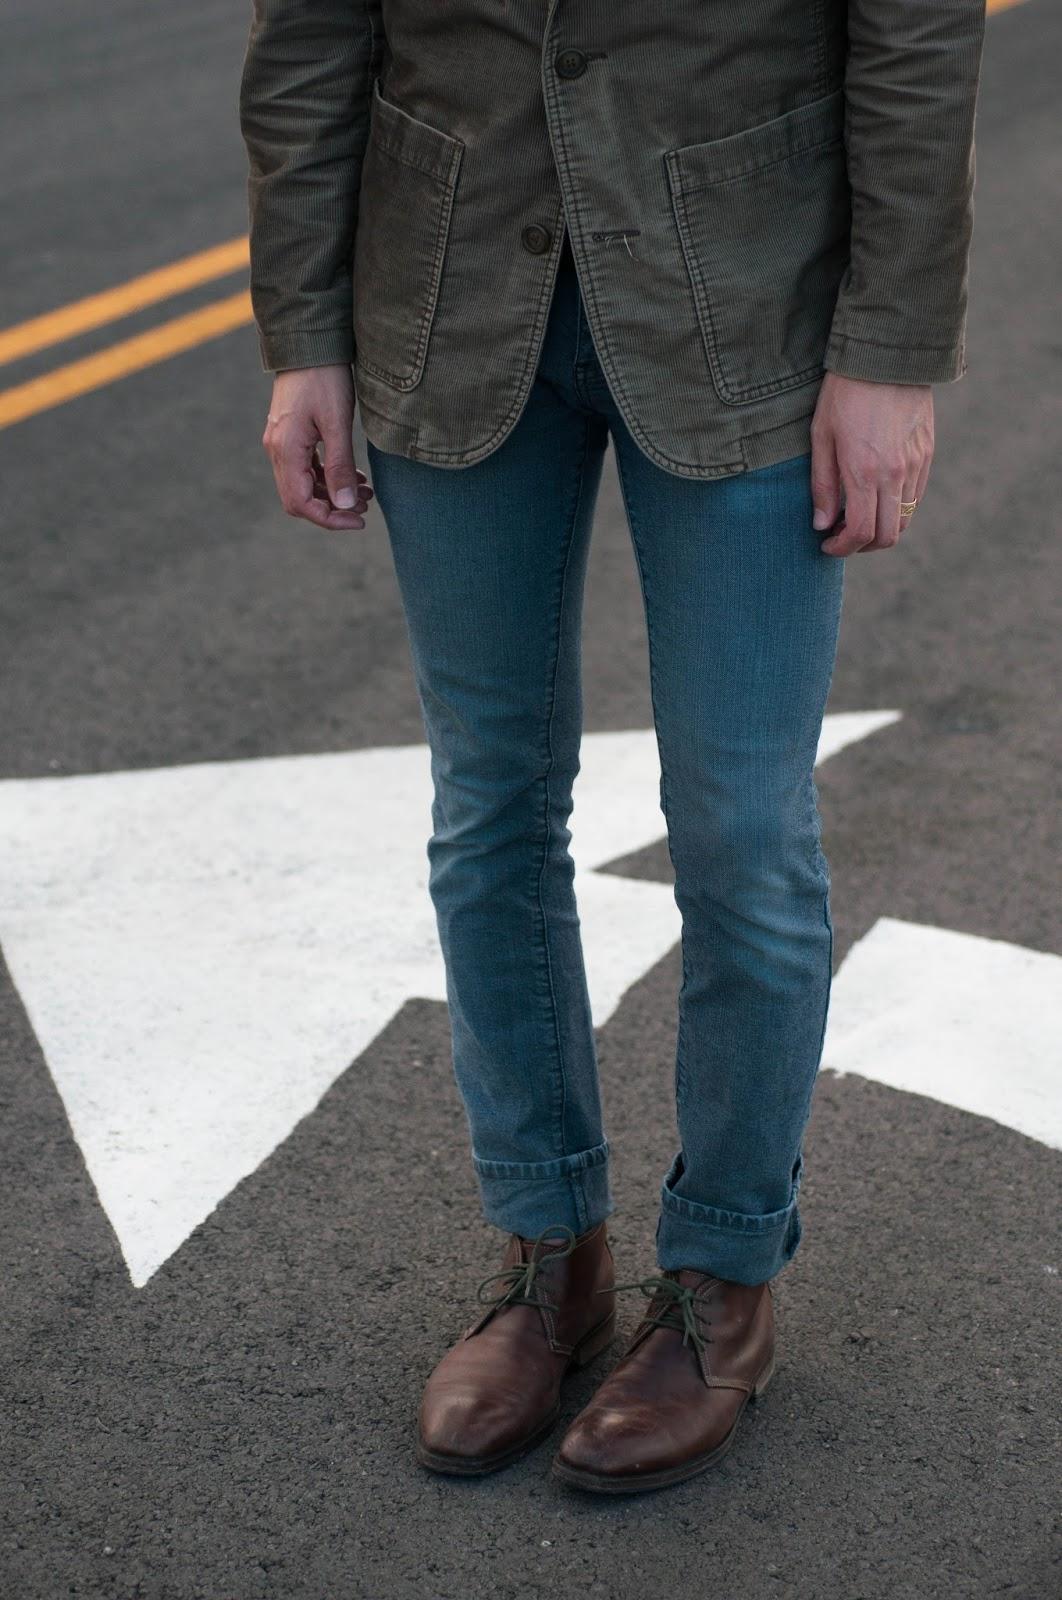 ootd, mens fashion, mens style, street arrow, css jeans, gordon rush, gordon rush boots